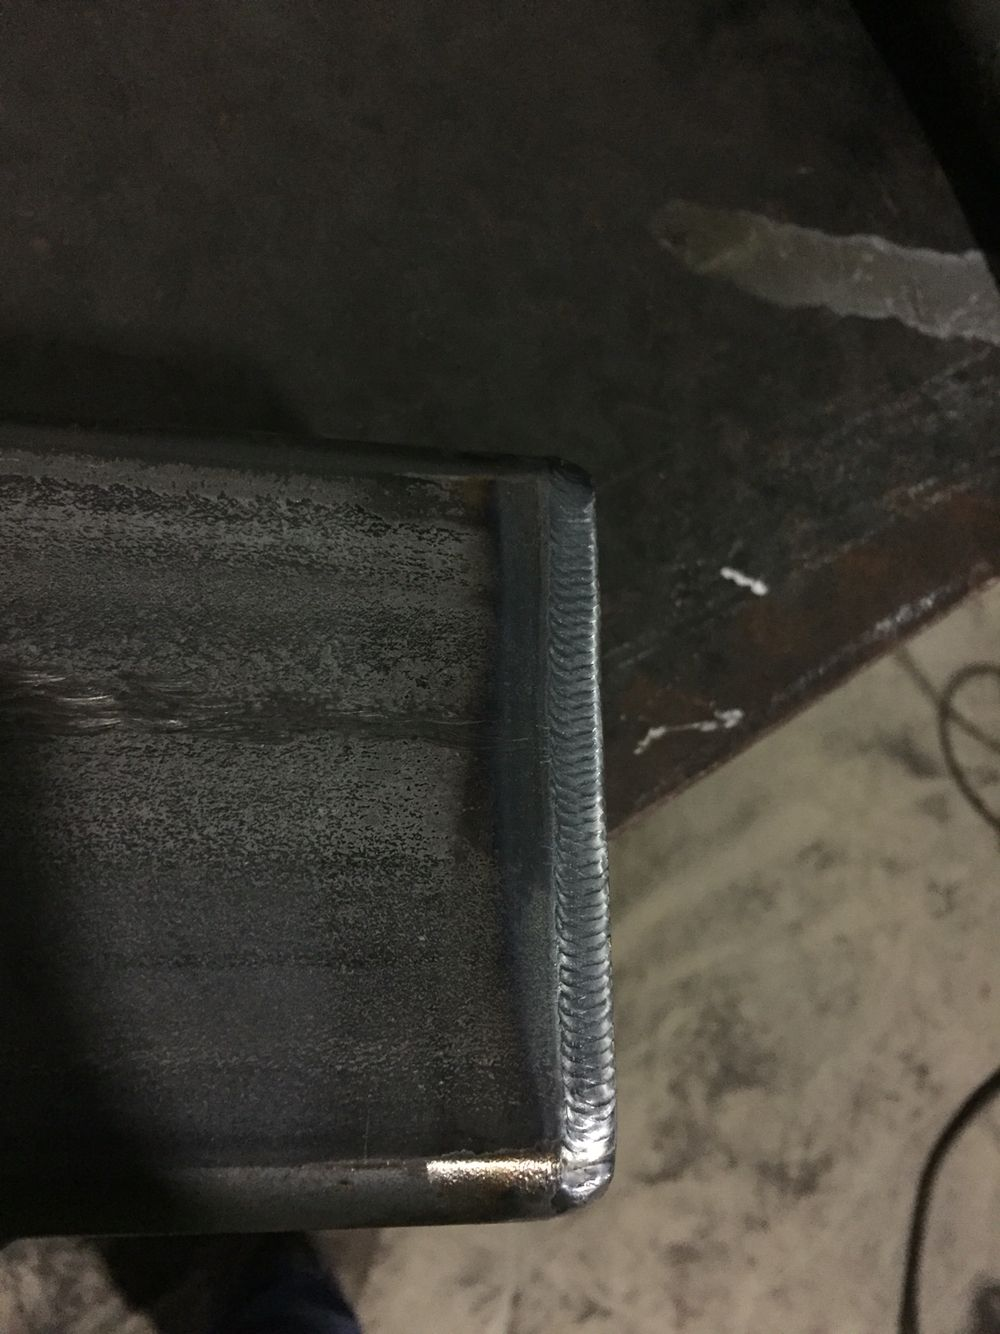 4/4 tube tig weld Sheet pan